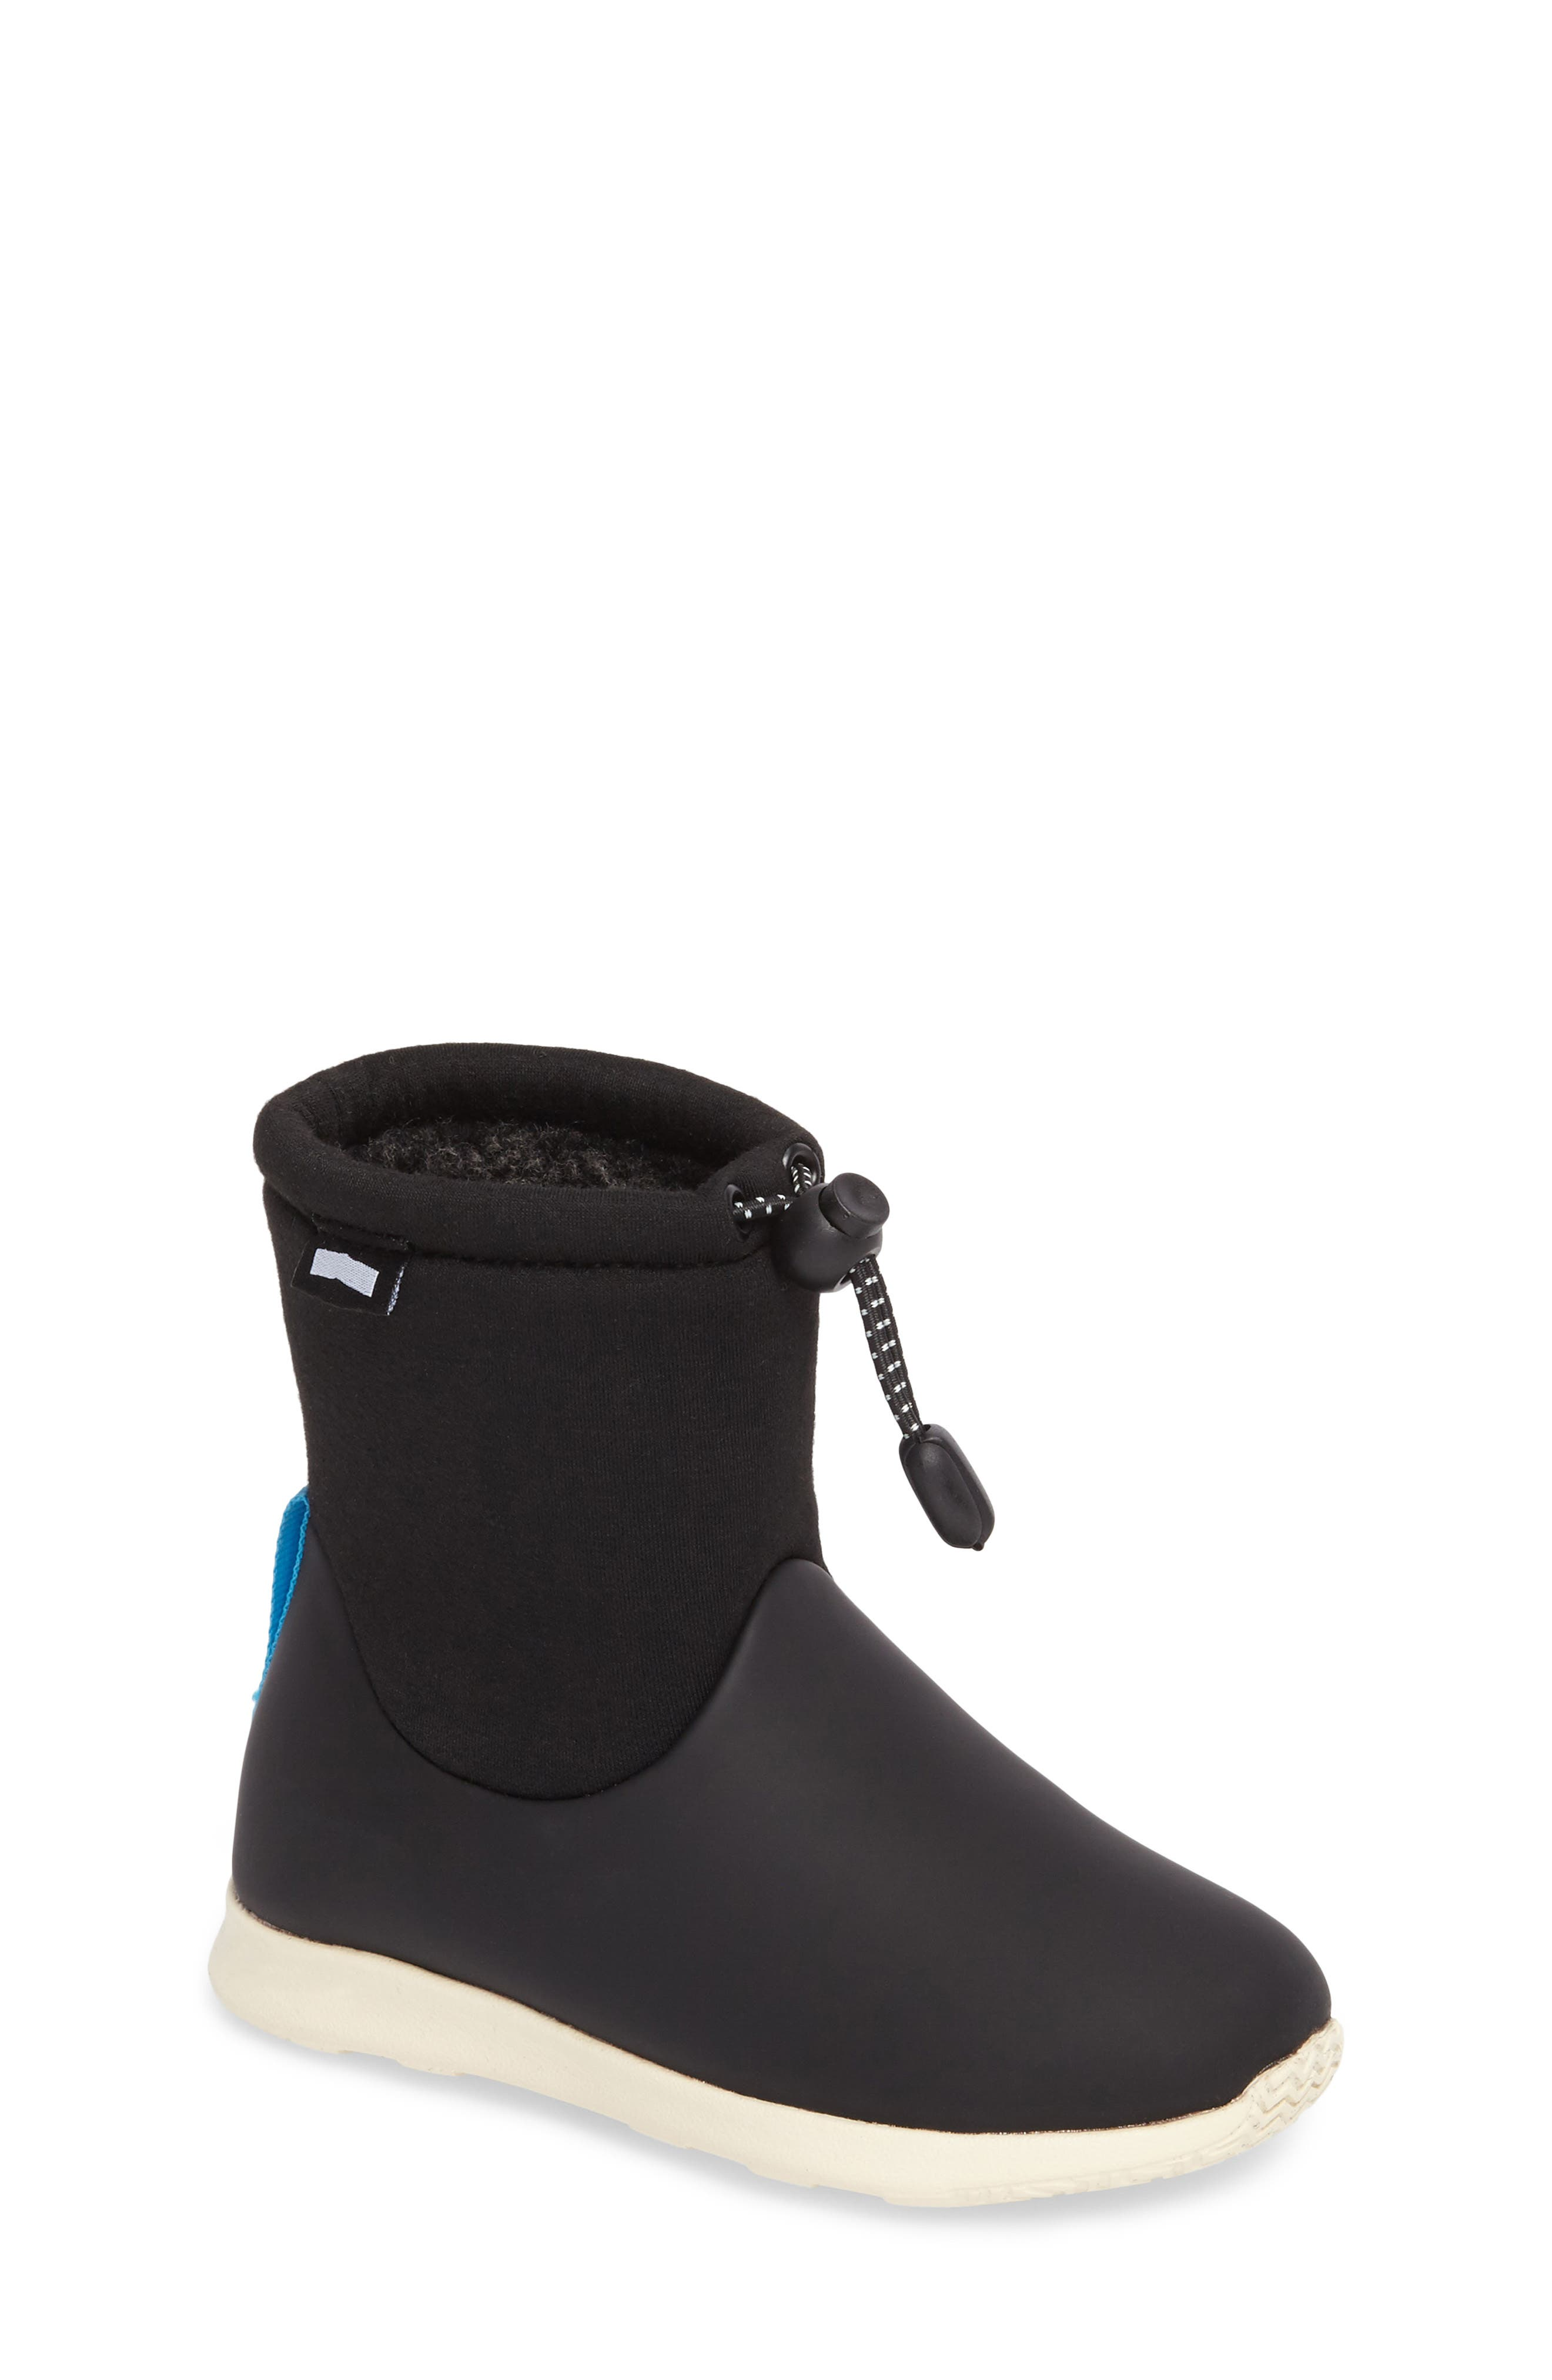 Alternate Image 1 Selected - Native Shoes AP Ranger Boot (Walker, Toddler & Little Kid)